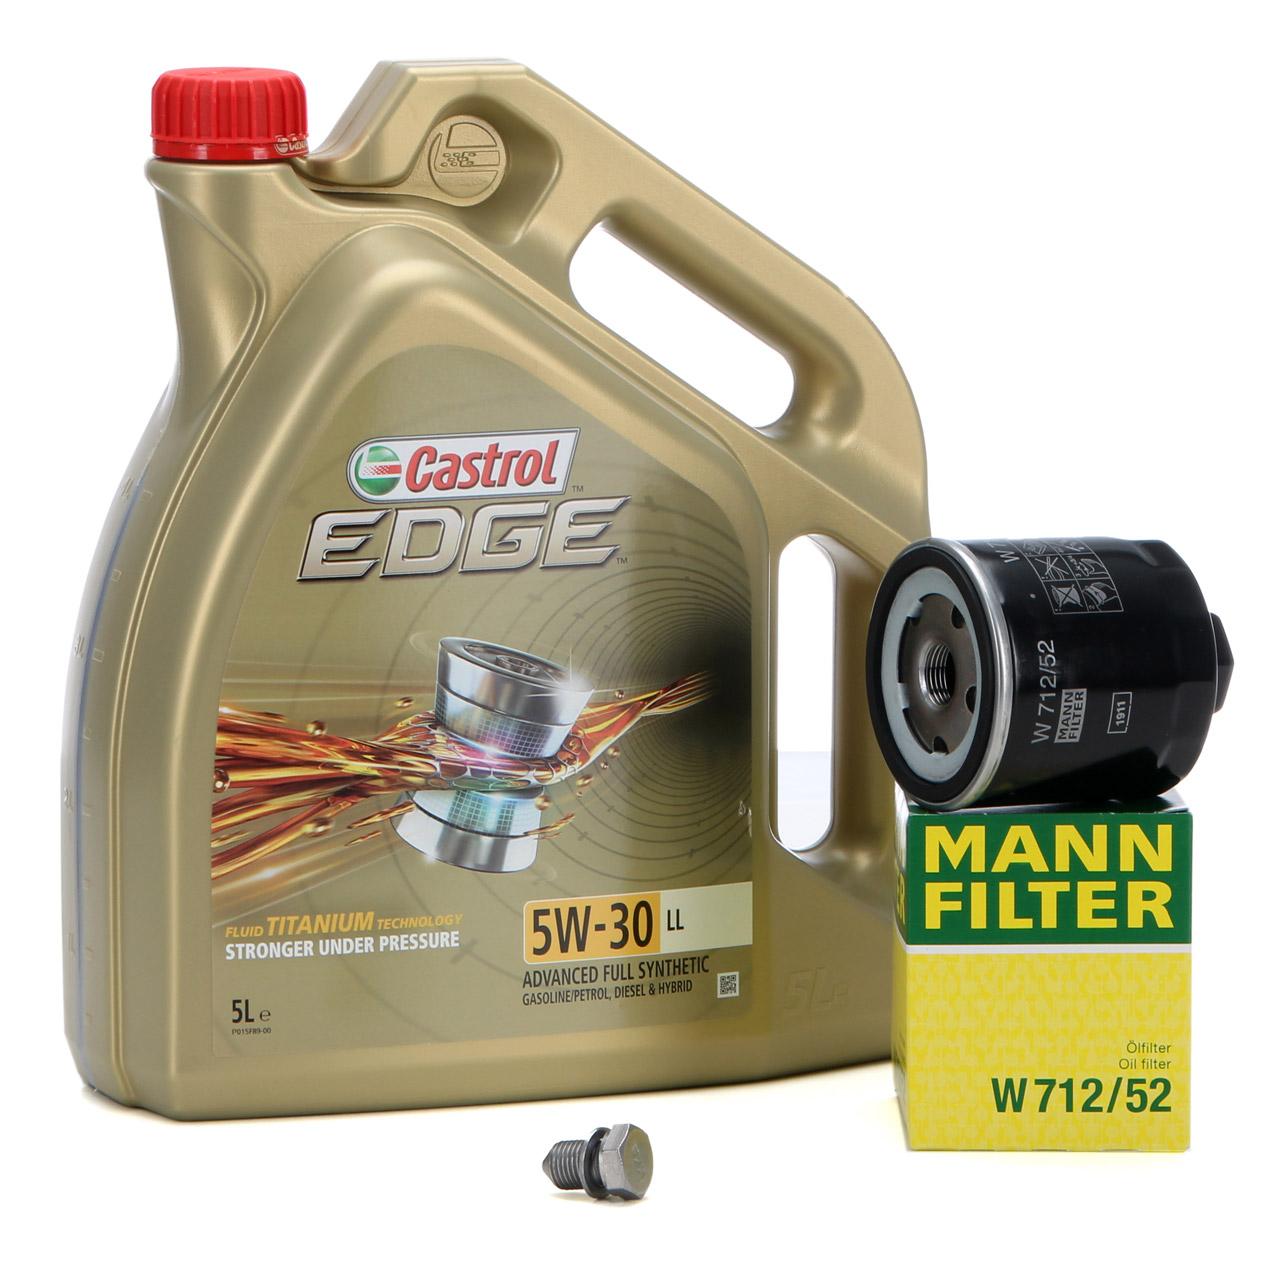 CASTROL EDGE Motoröl ÖL TITANIUM 5W30 LL 5L 5 Liter + MANN Ölfilter W712/52